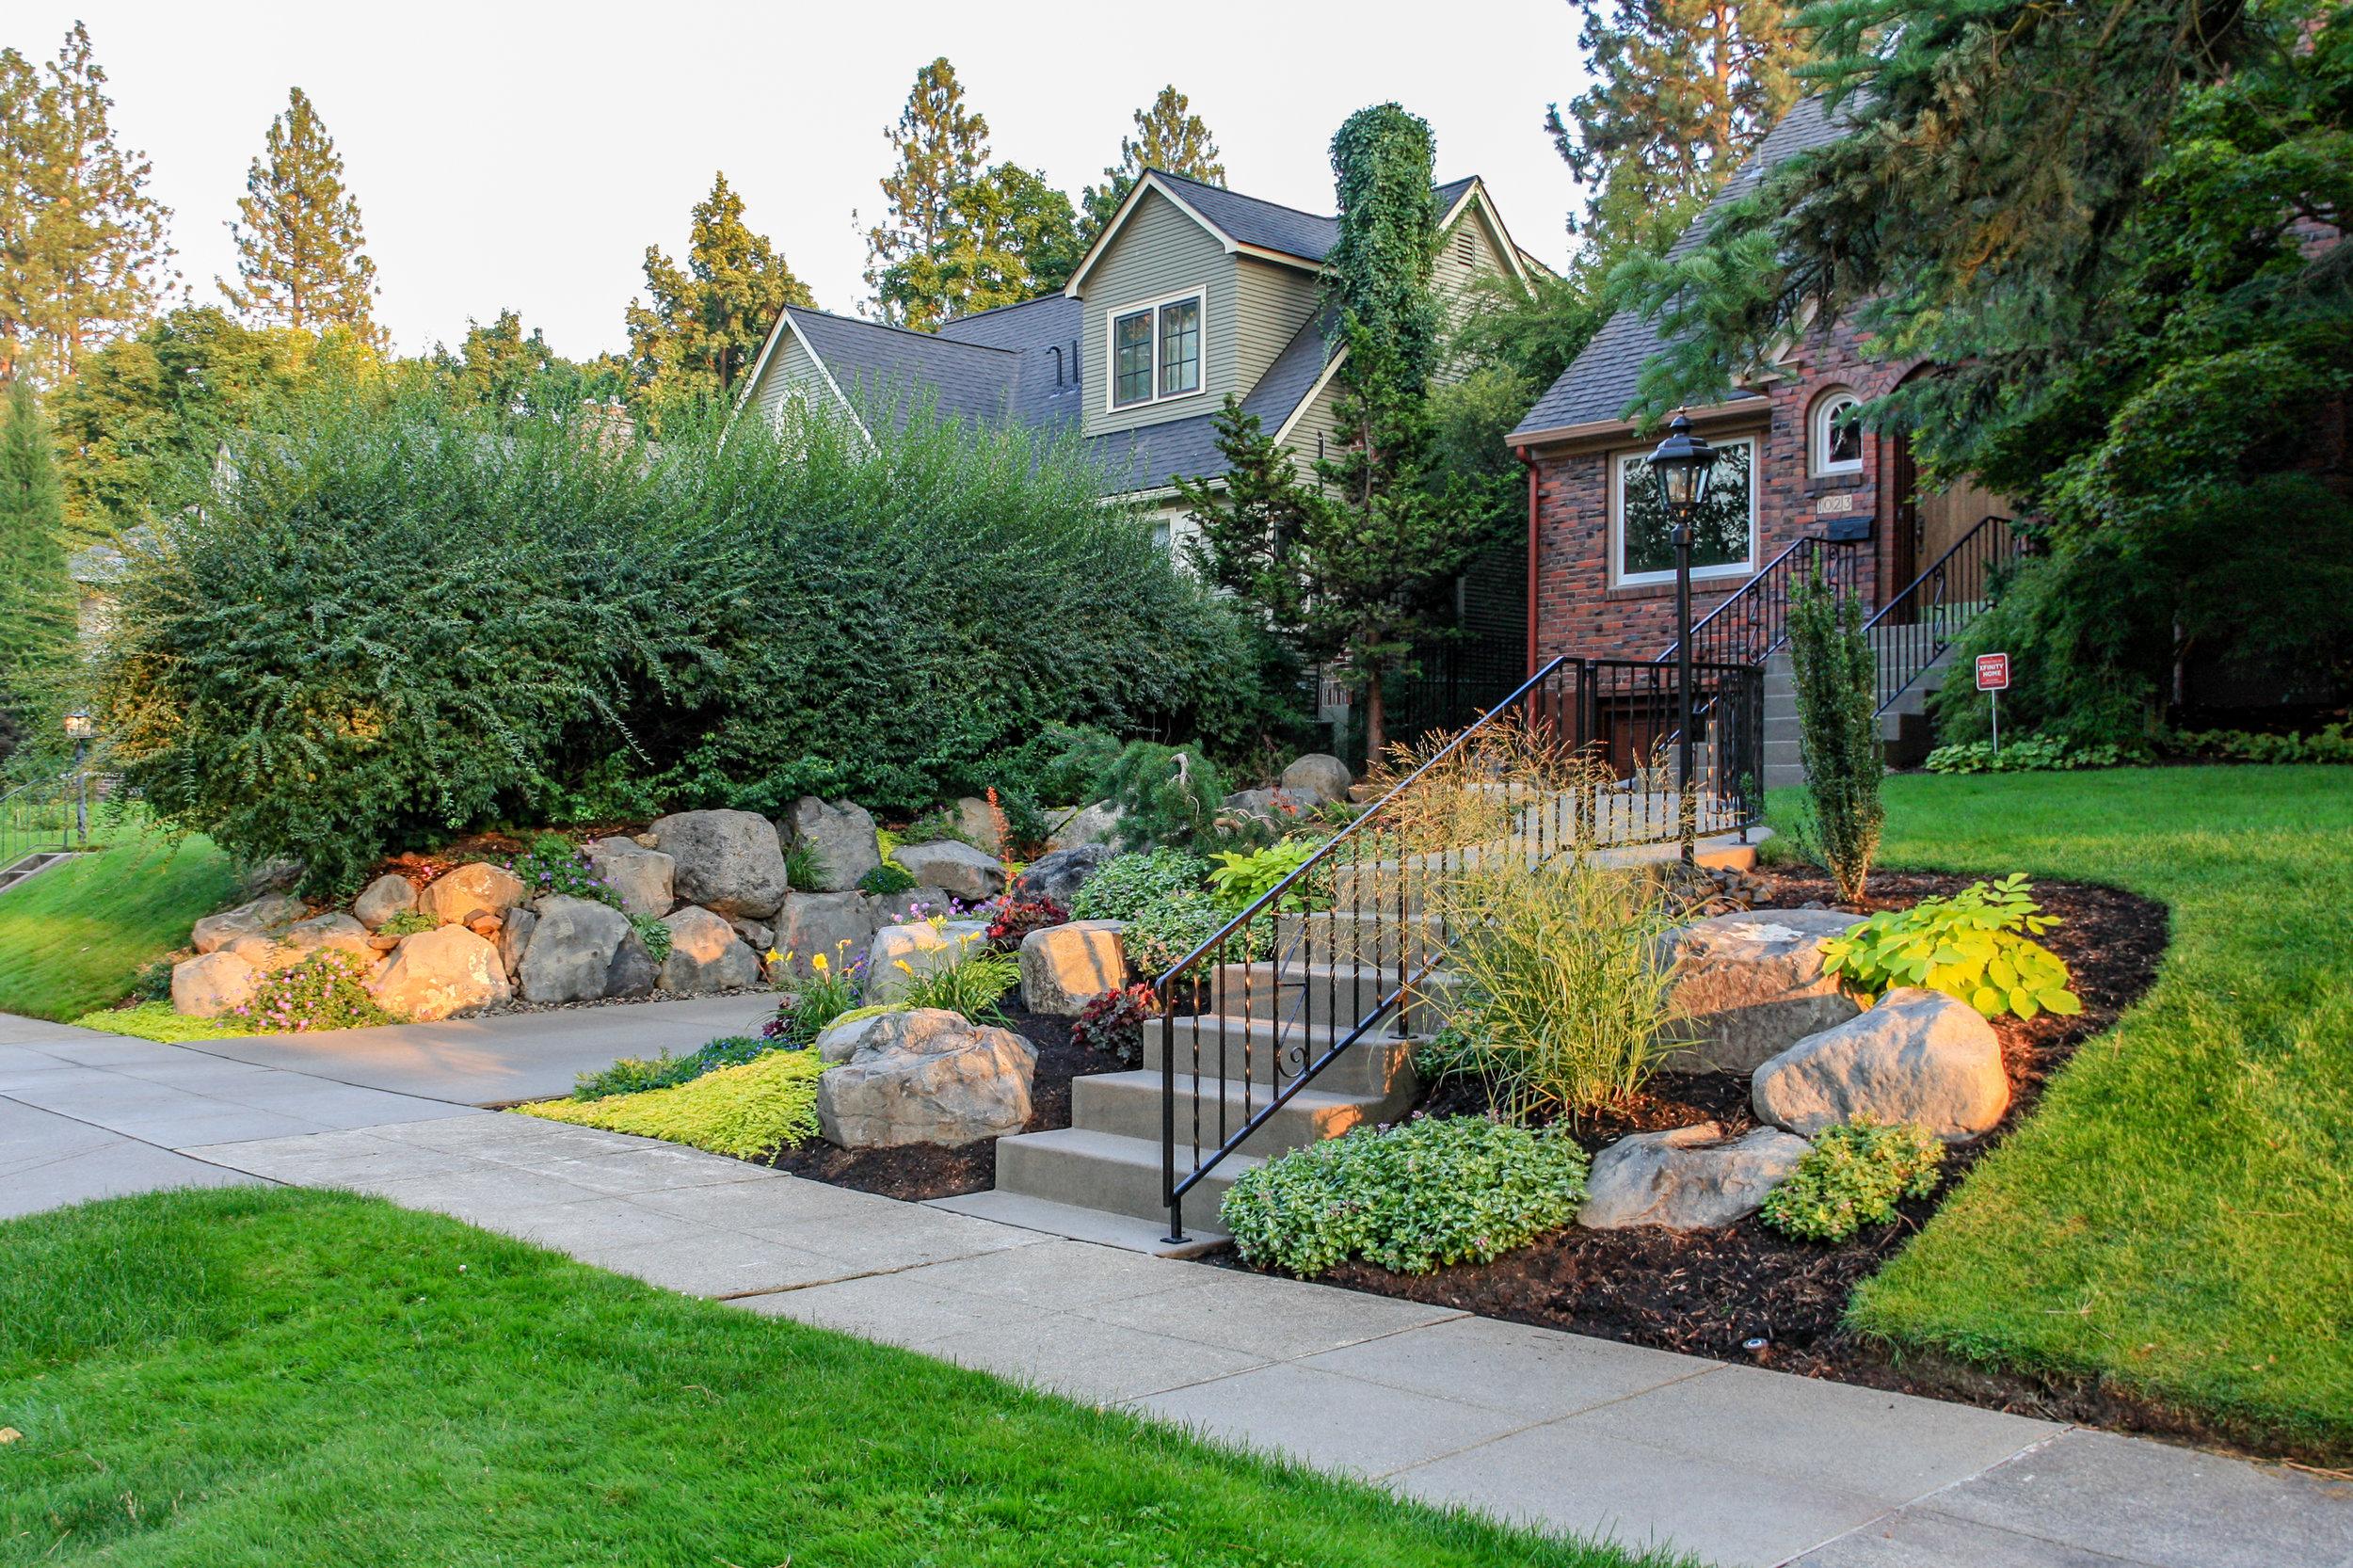 spokane south hill landscaping and sidewalk repair